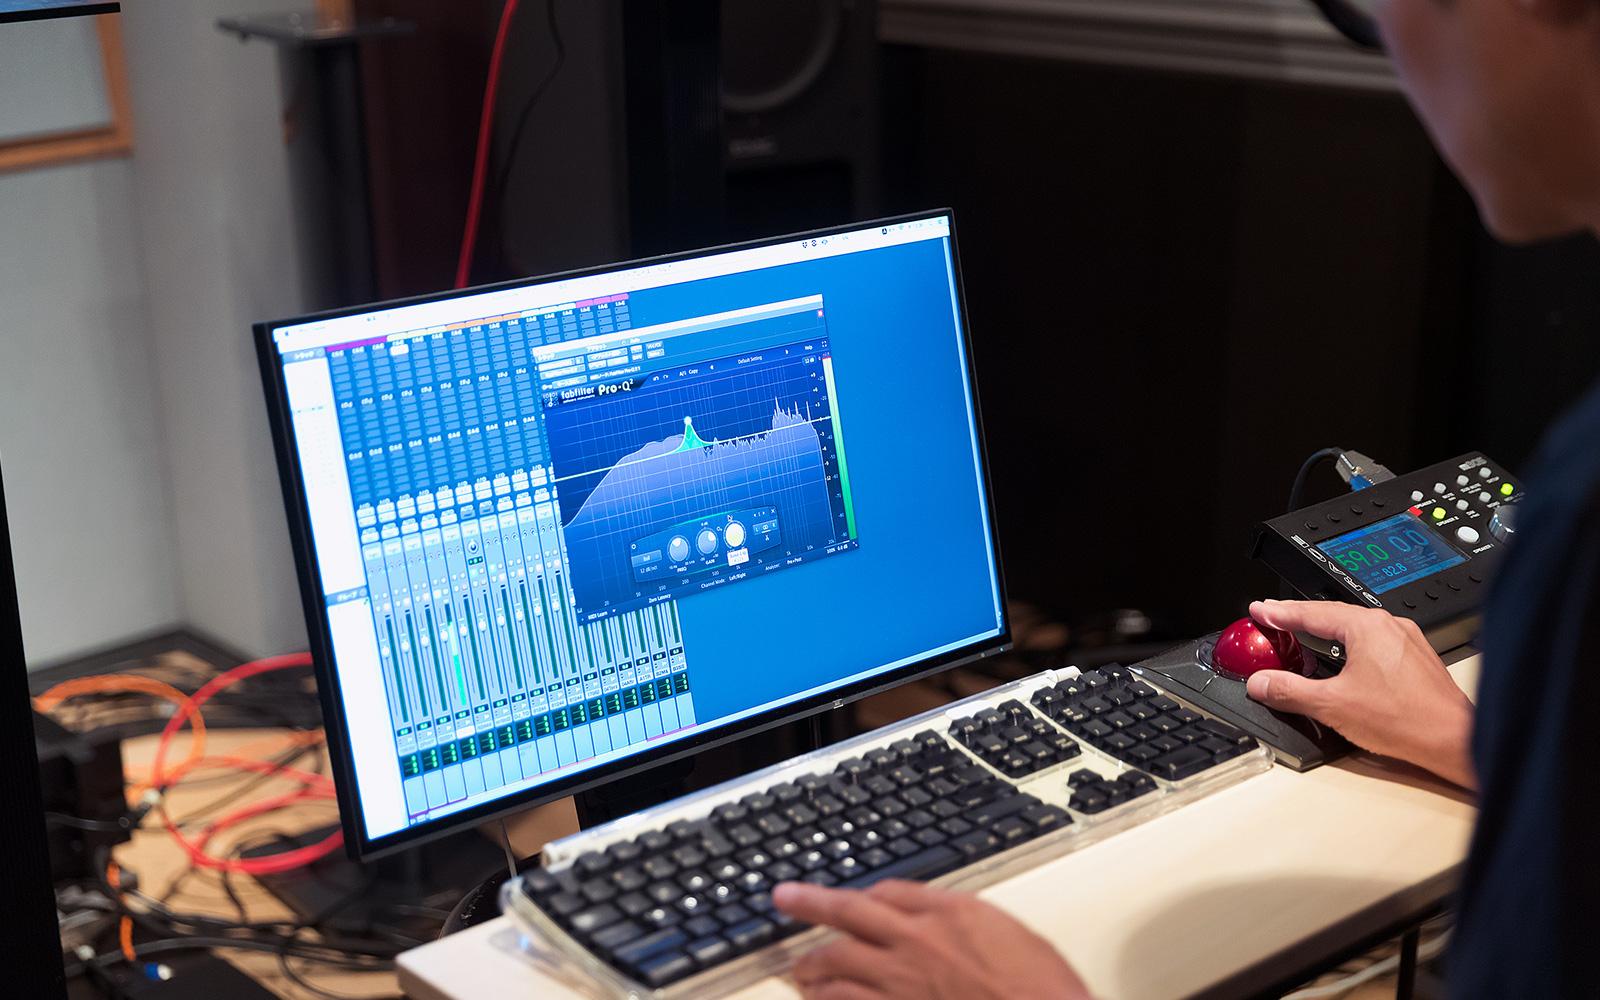 RA: A discussion on studio monitors